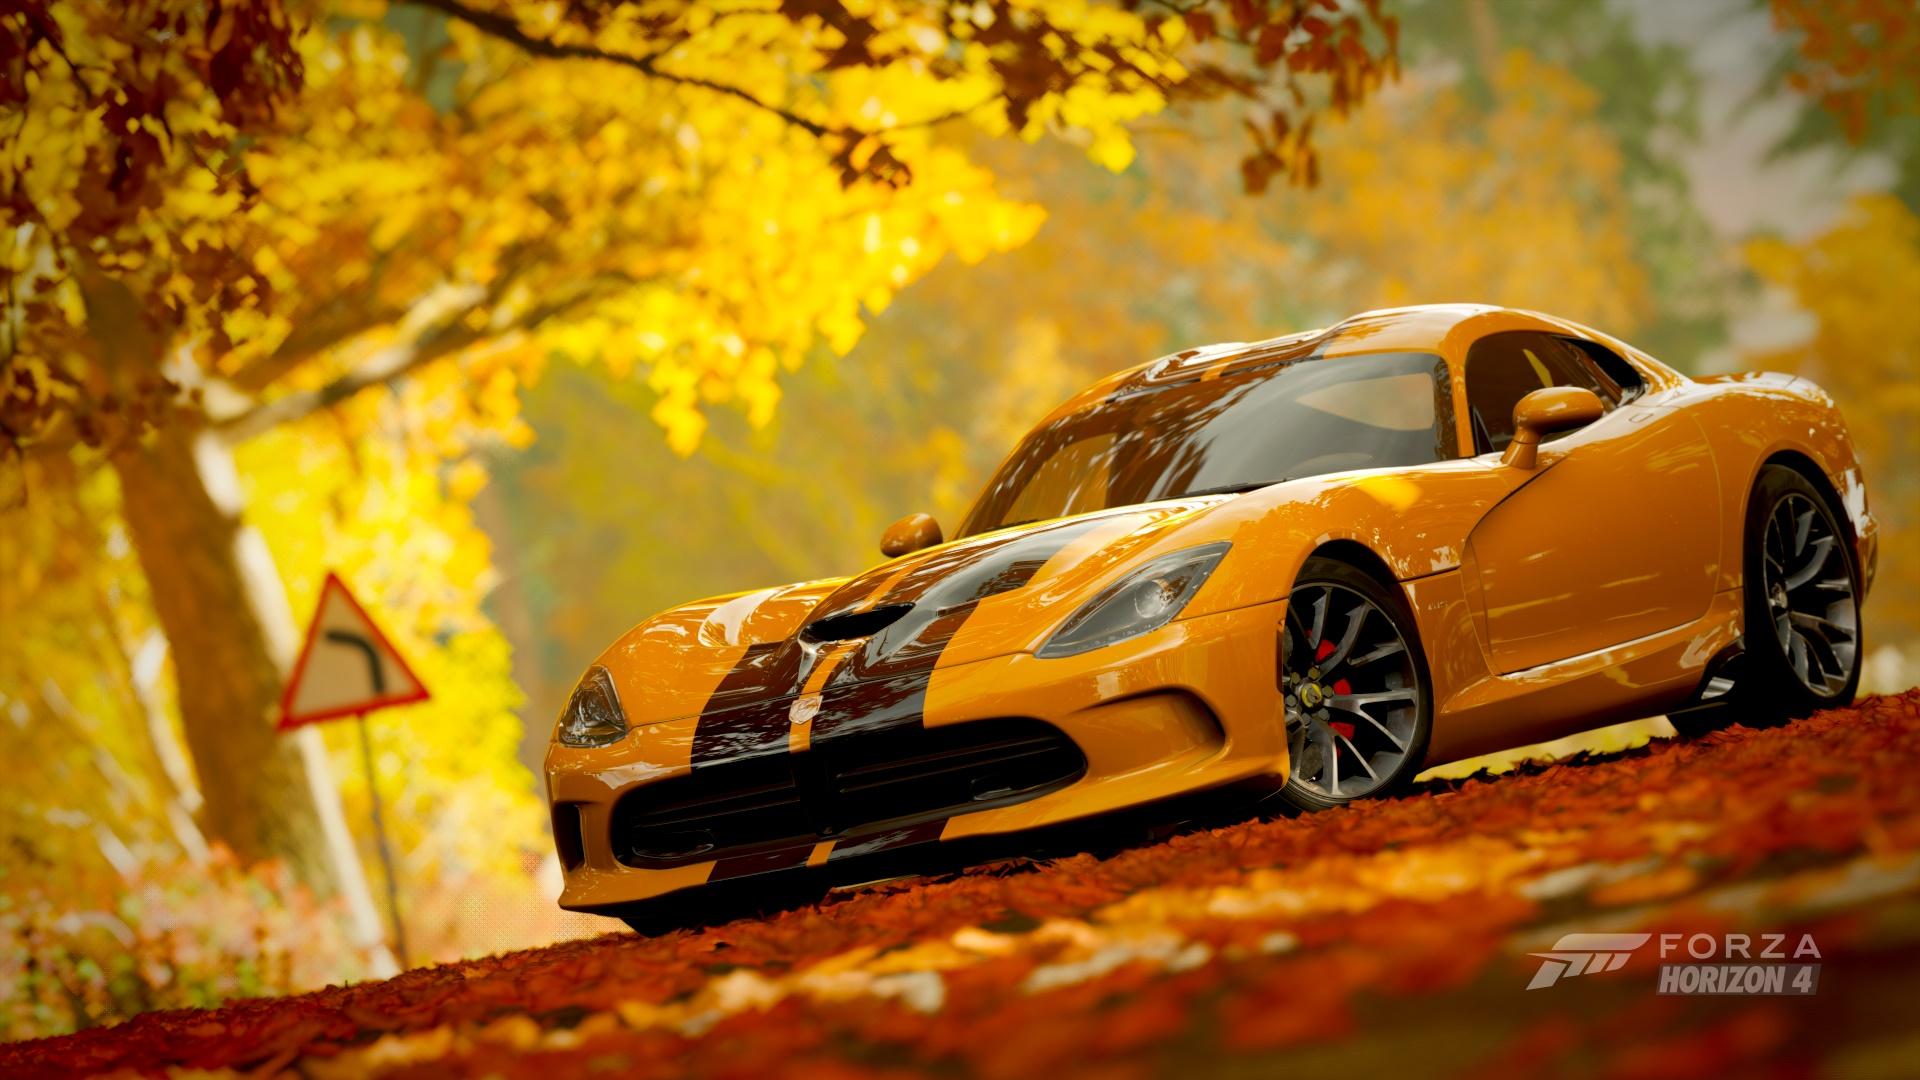 Viper GTS.jpg - Forza Horizon 4